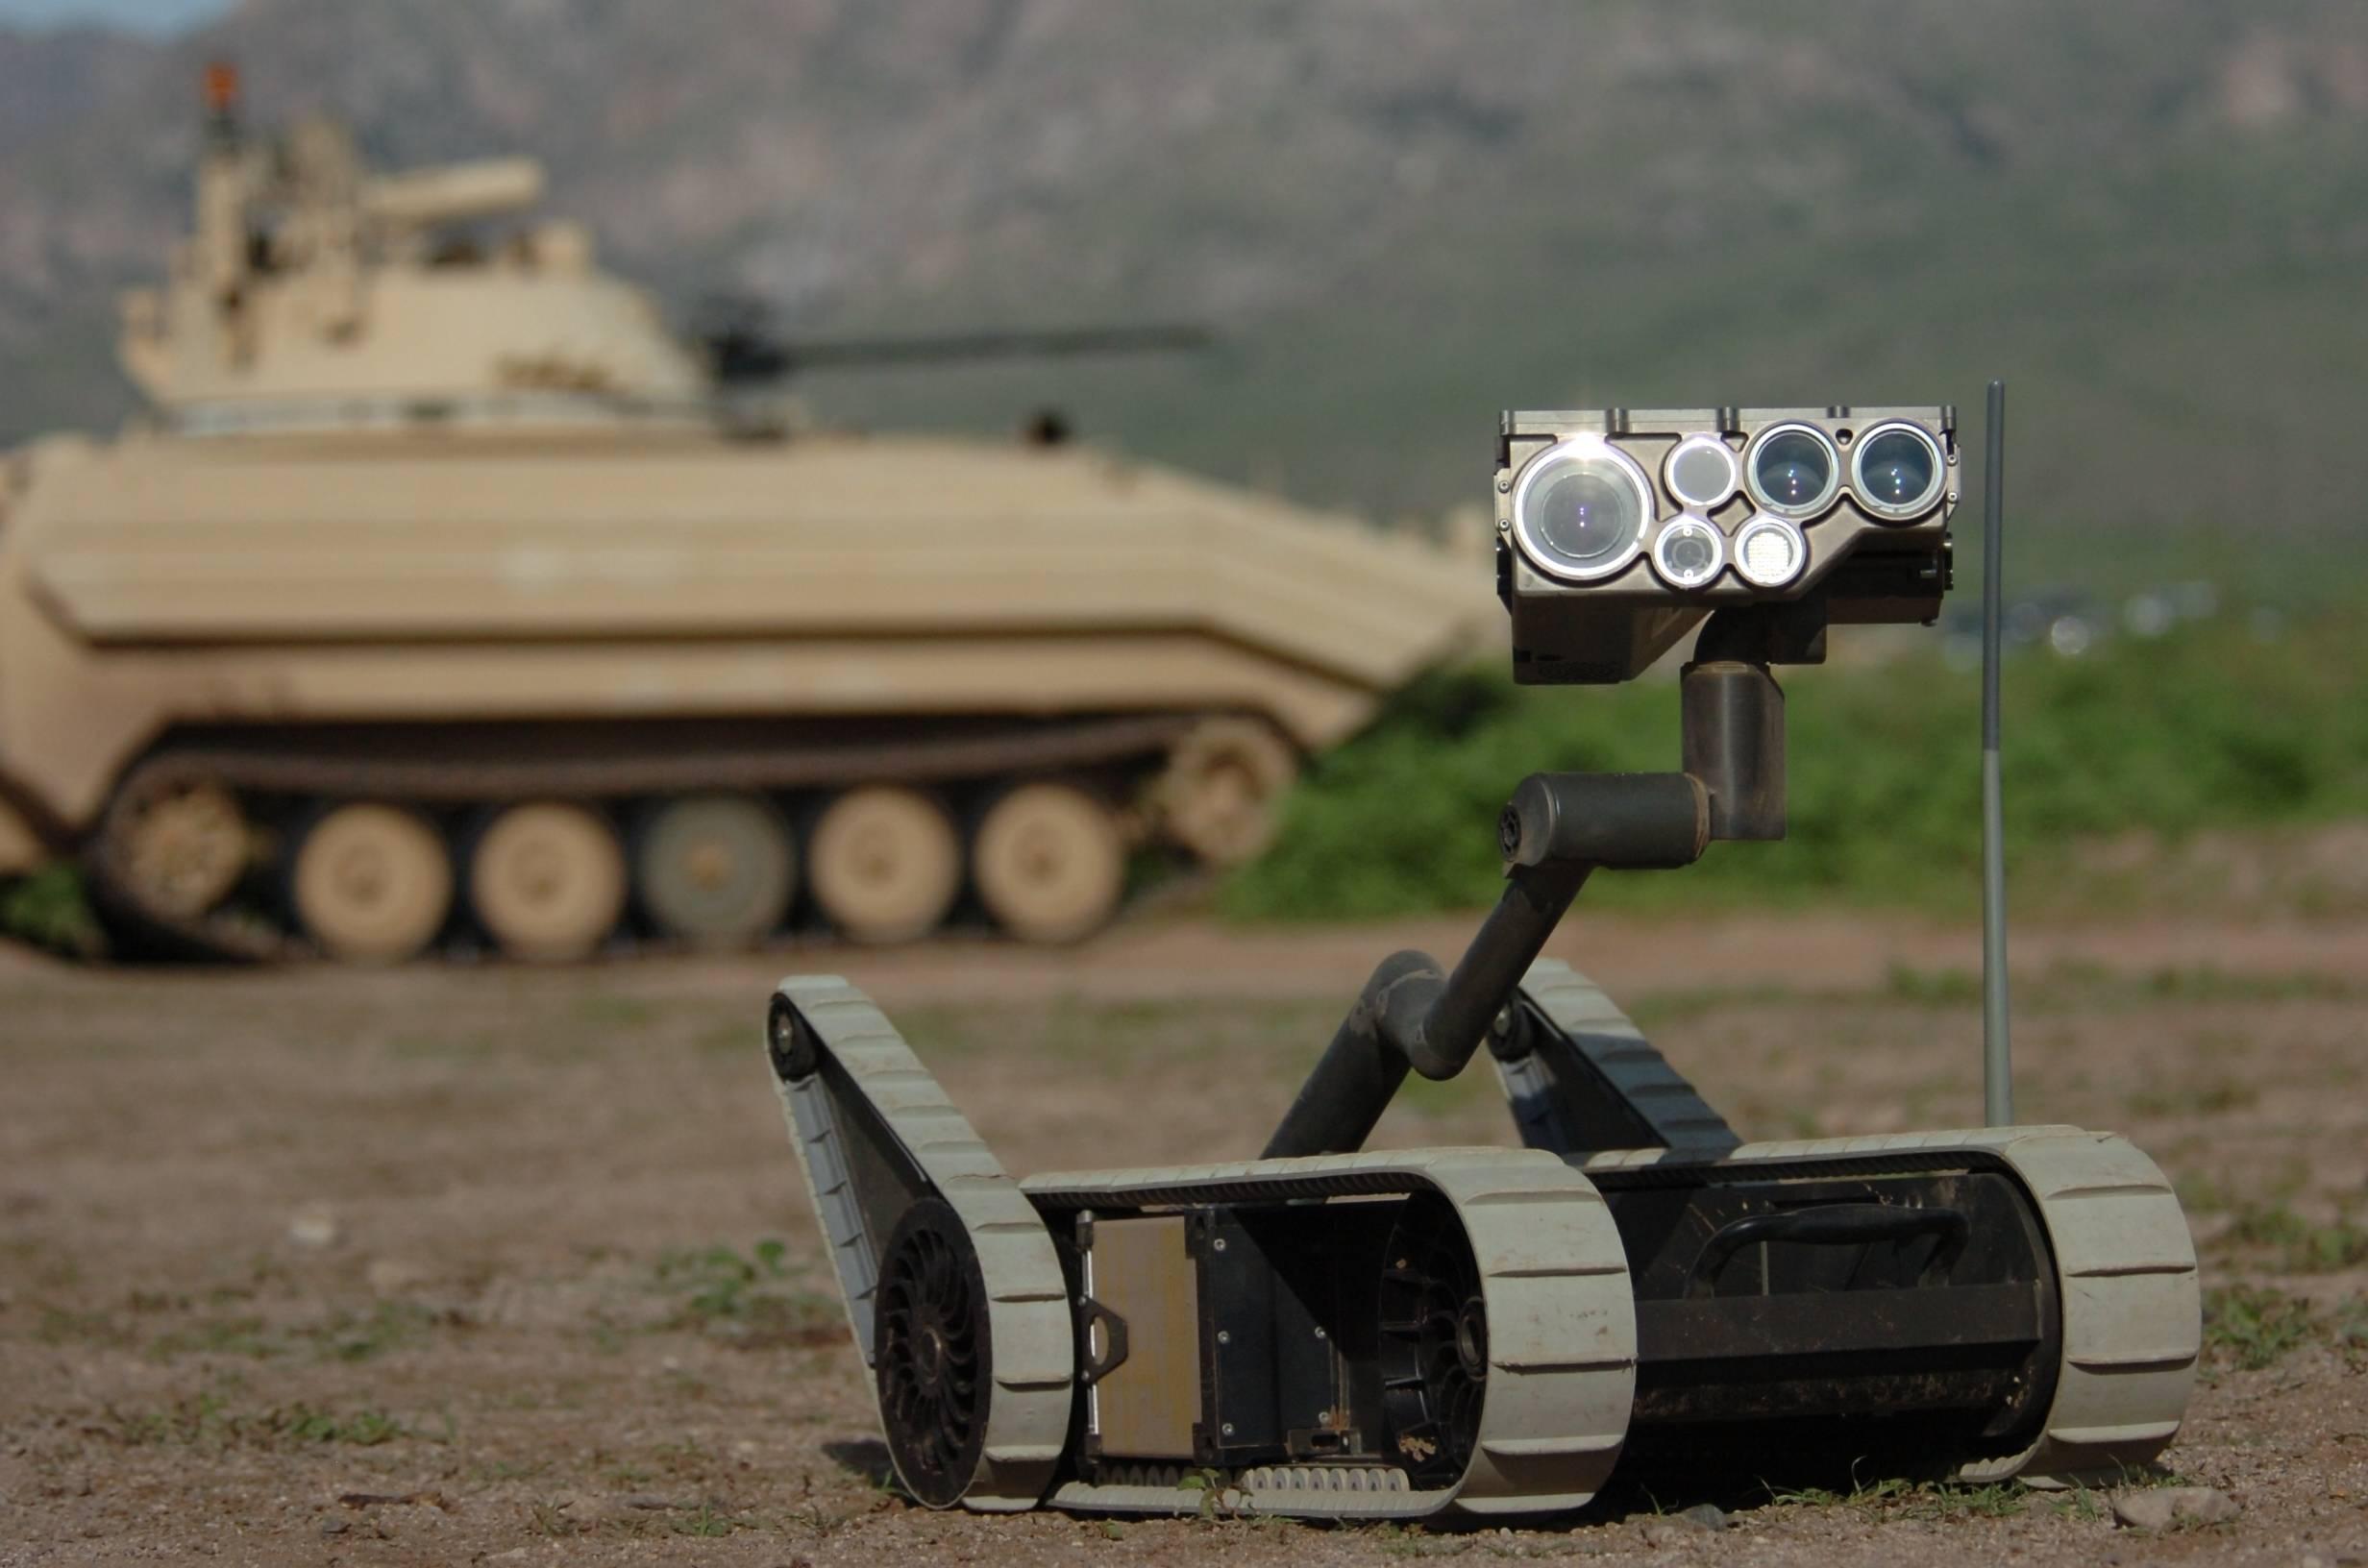 Remote Control Army Robot